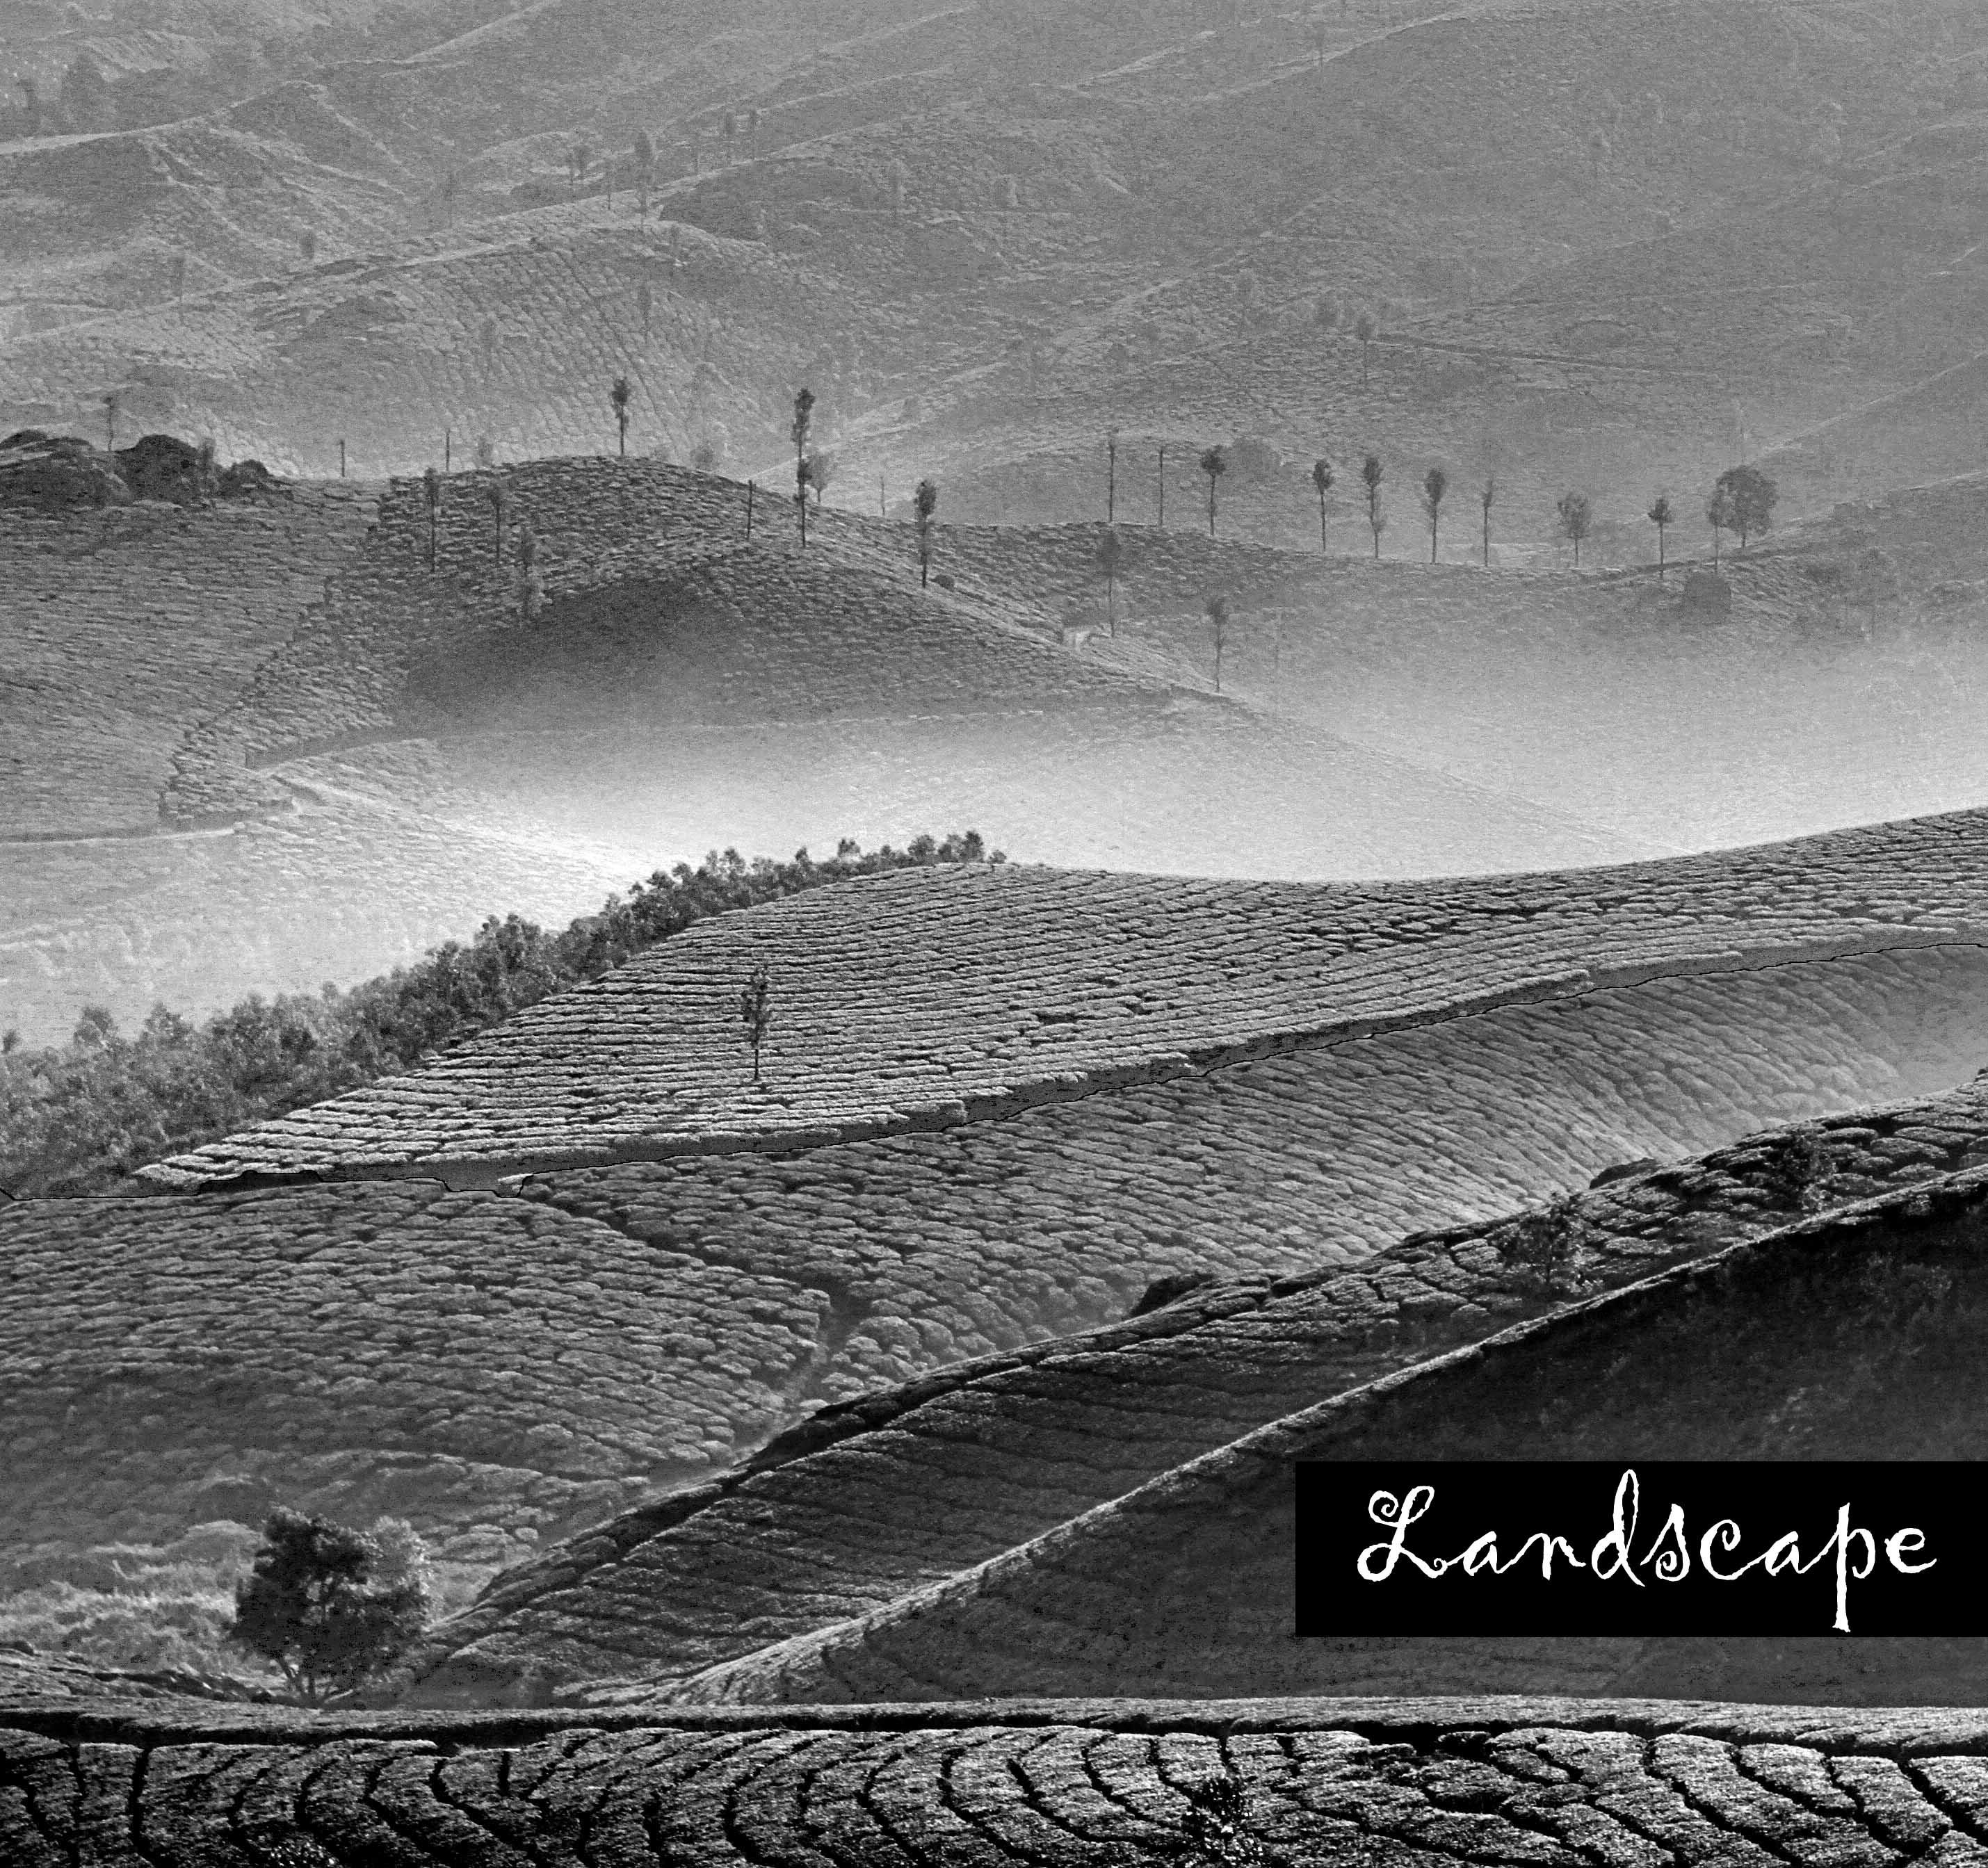 Landscapes - Aloke Lal & Maanas Lal